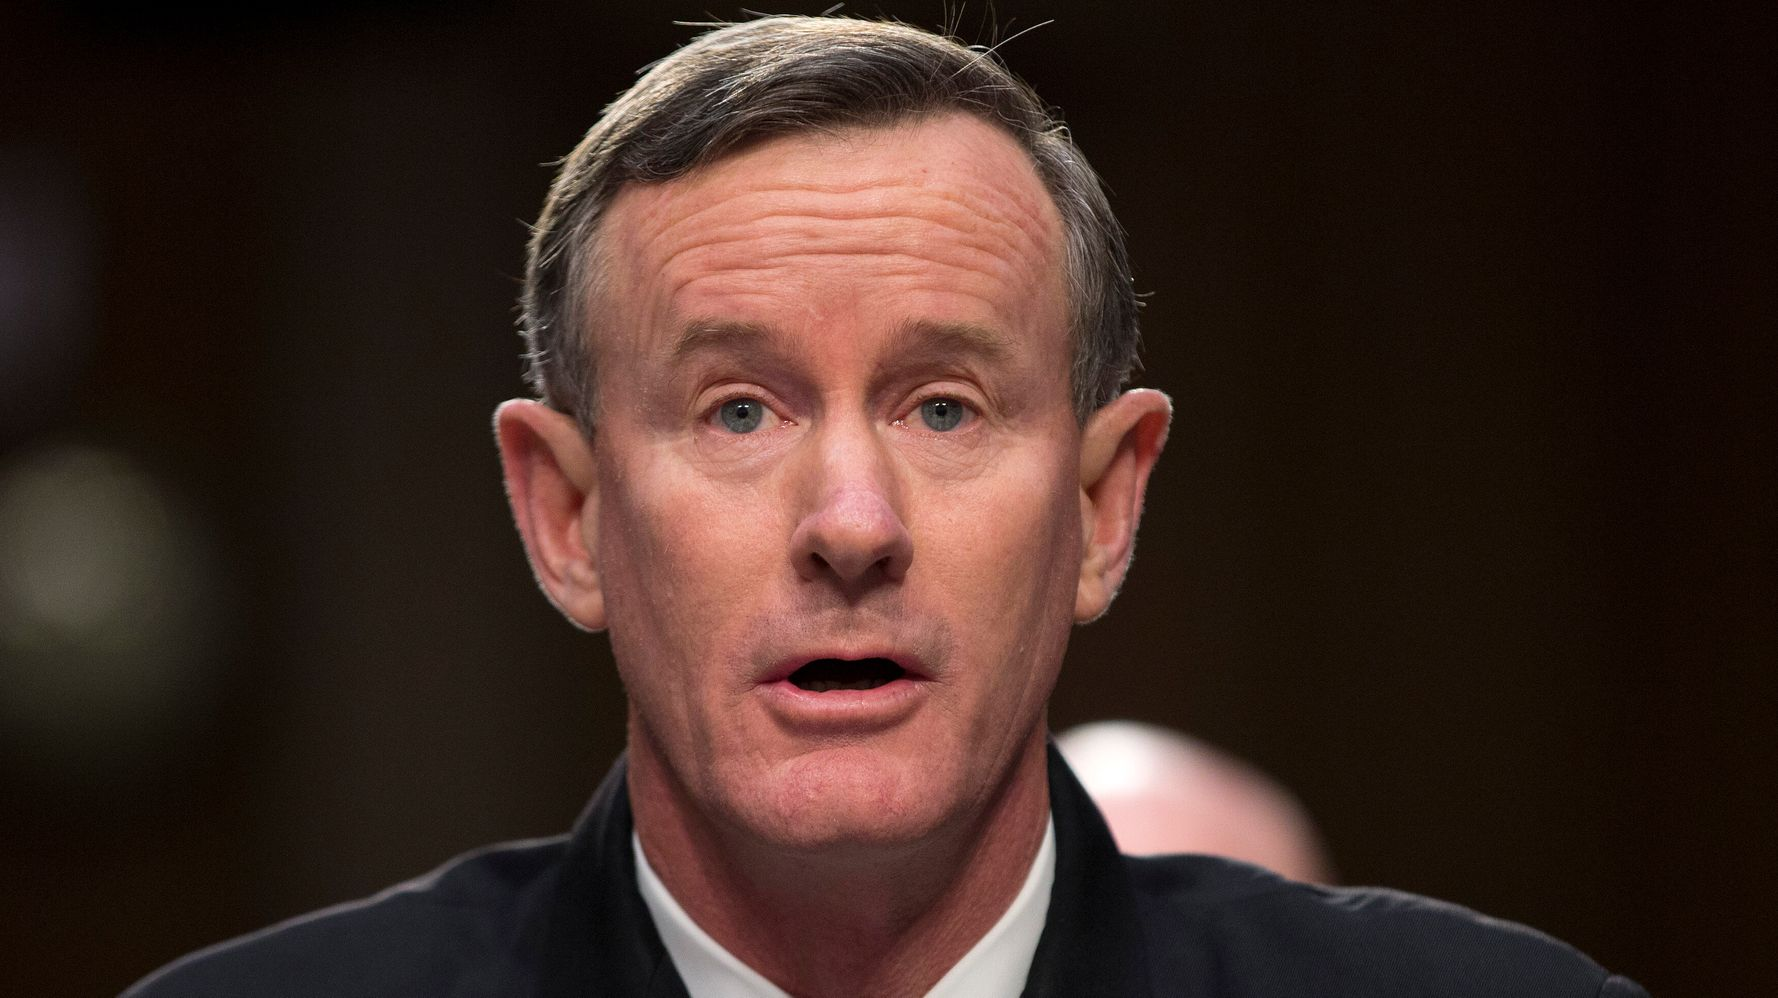 Admiral In Charge Of Bin Laden Raid Endorses Biden In Stinging Trump Rebuke